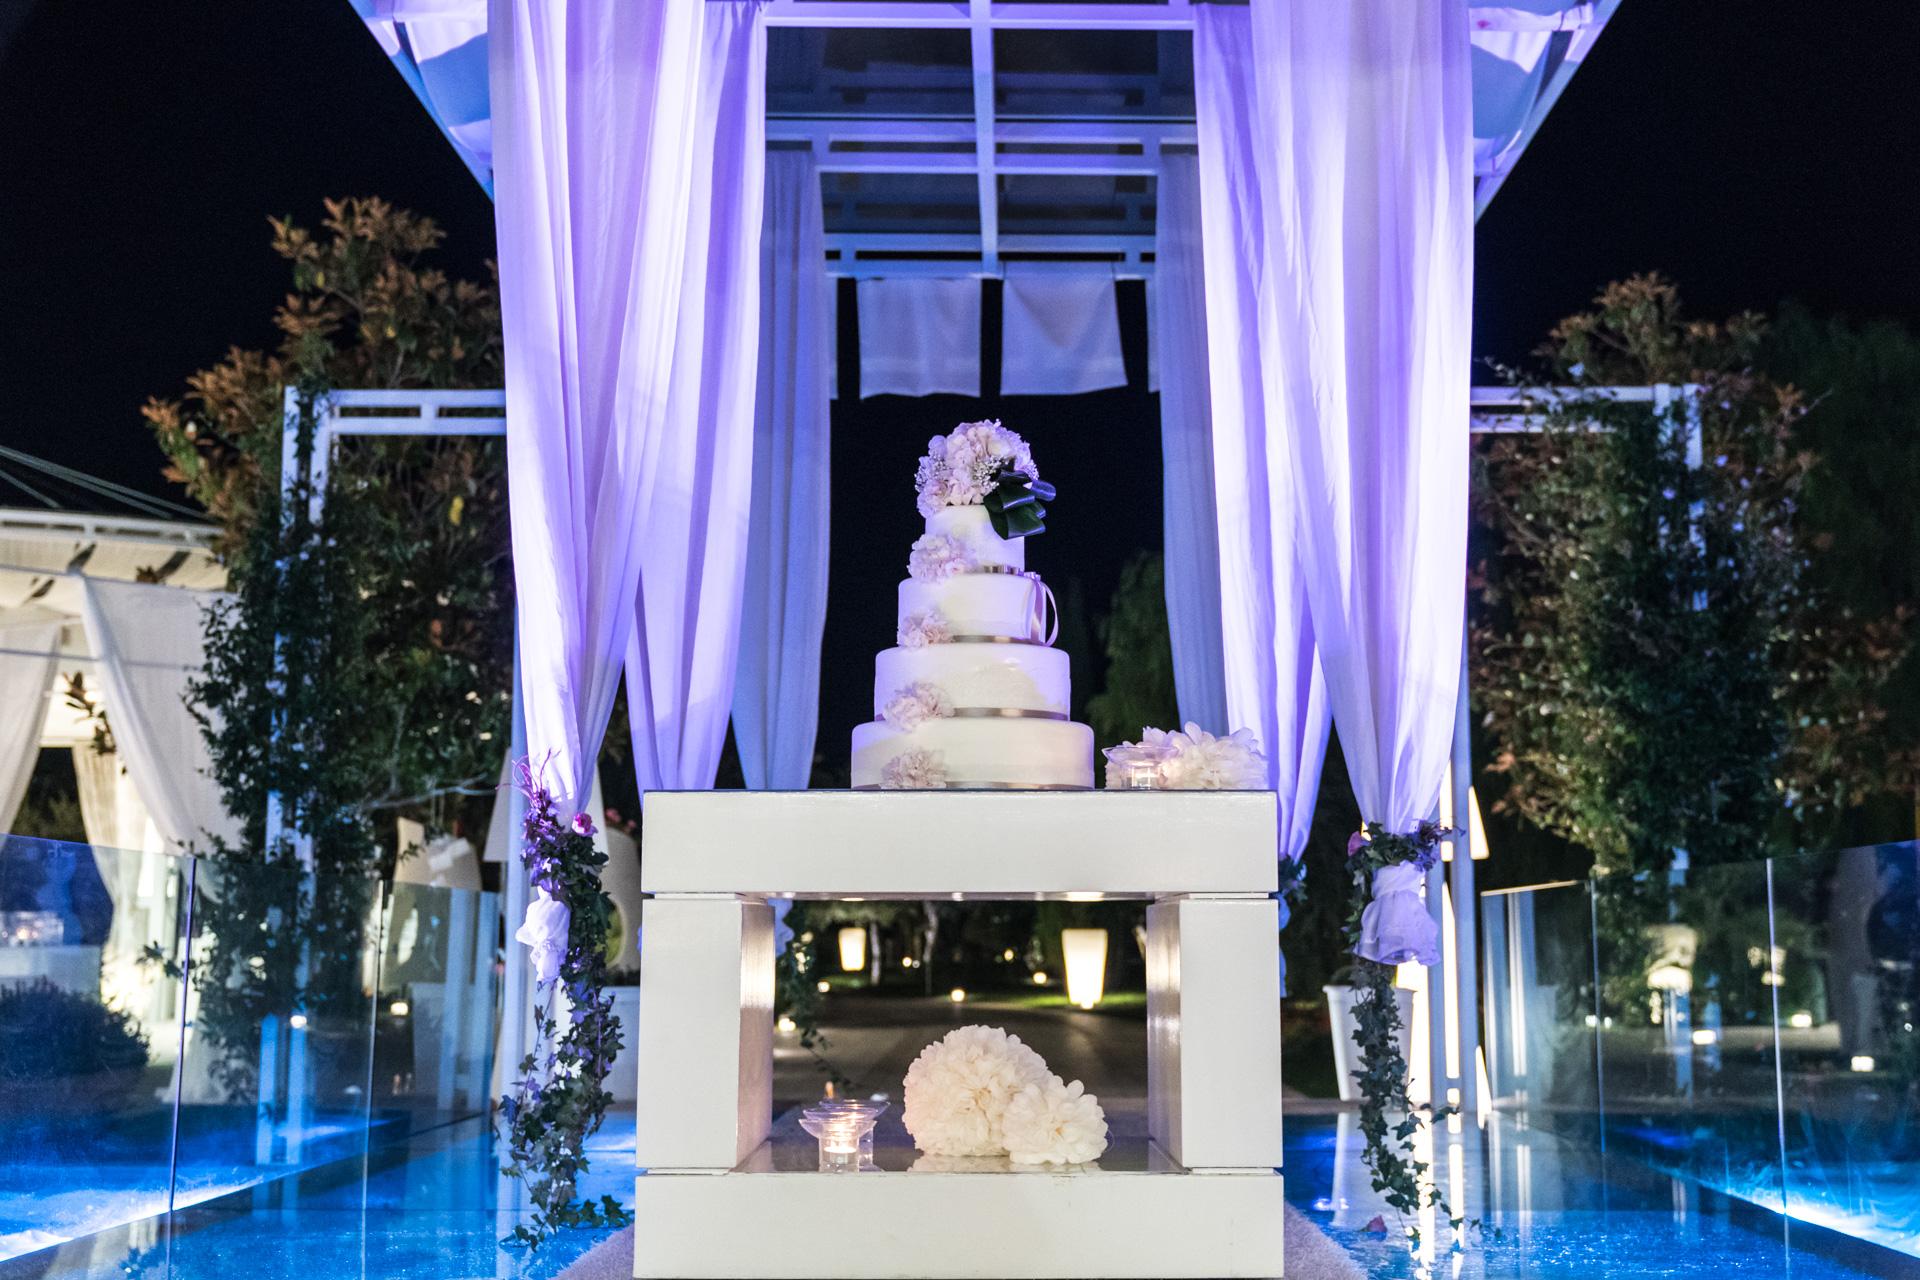 merafina photographer alfonso merafina fotografo wedding matrimonio andria francesca e antonio (26)